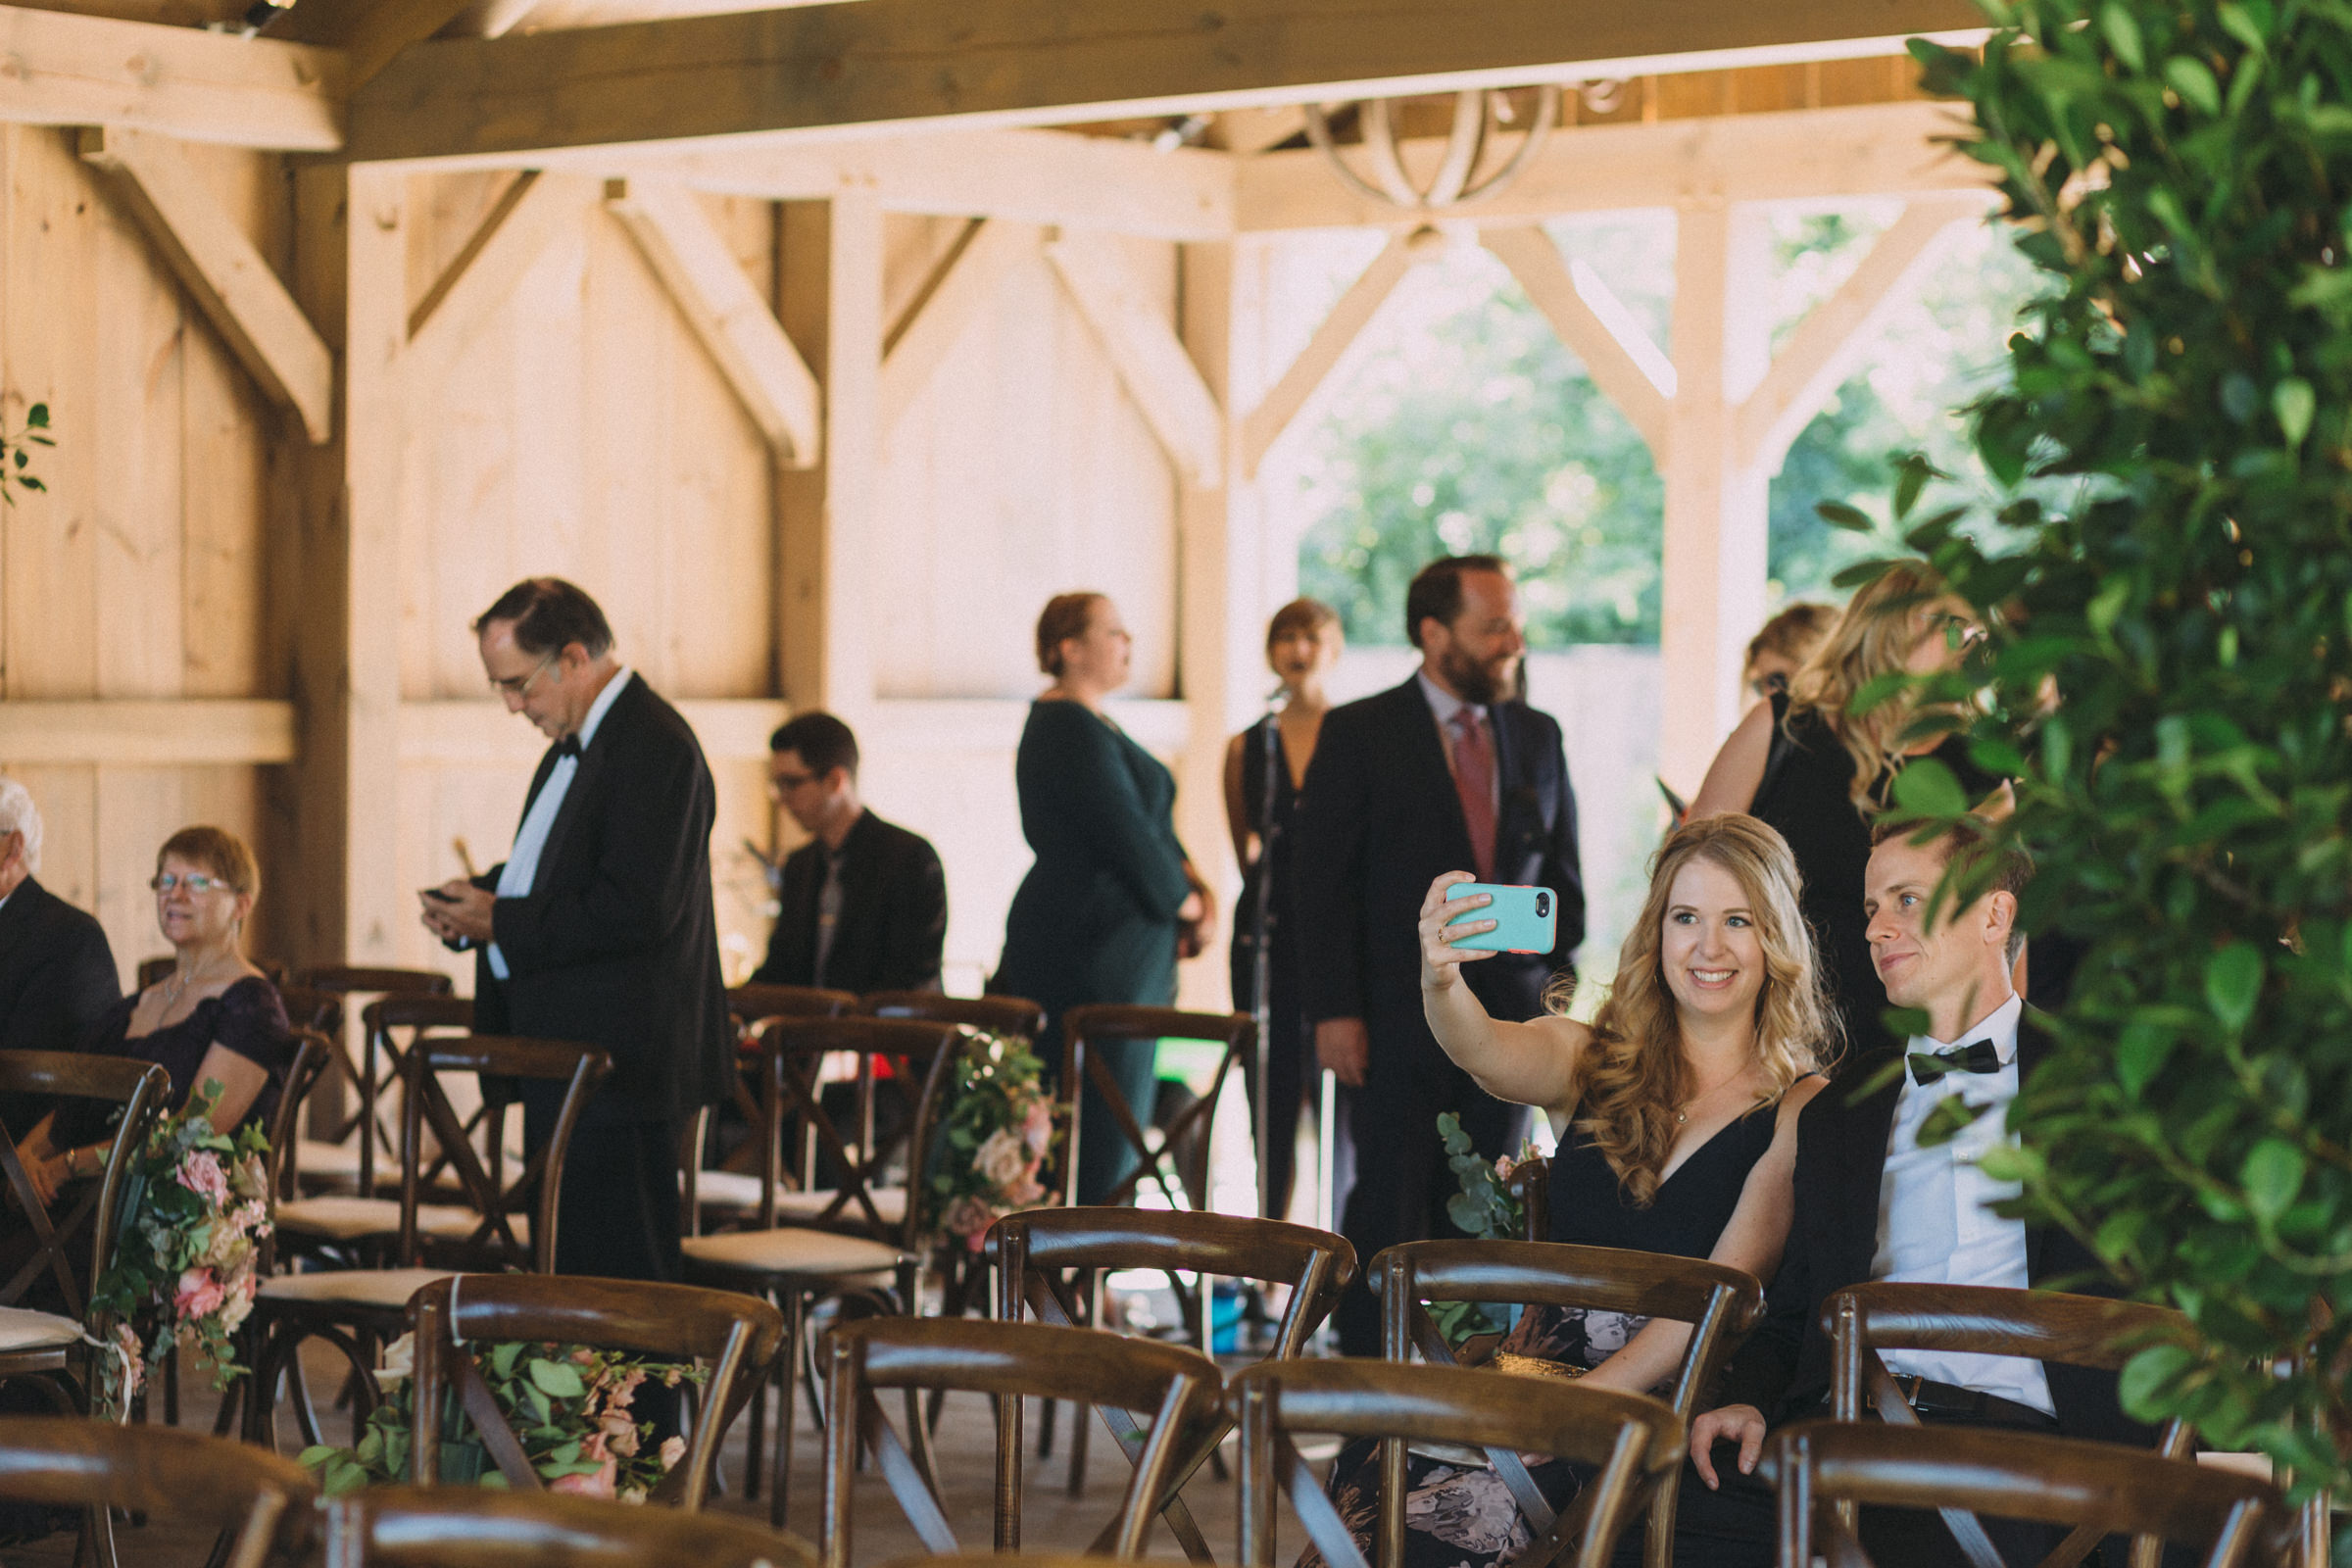 Langdon-Hall-wedding-photography-Cambridge-by-Sam-Wong-of-Visual-Cravings_Sarah-Ryan_30.jpg